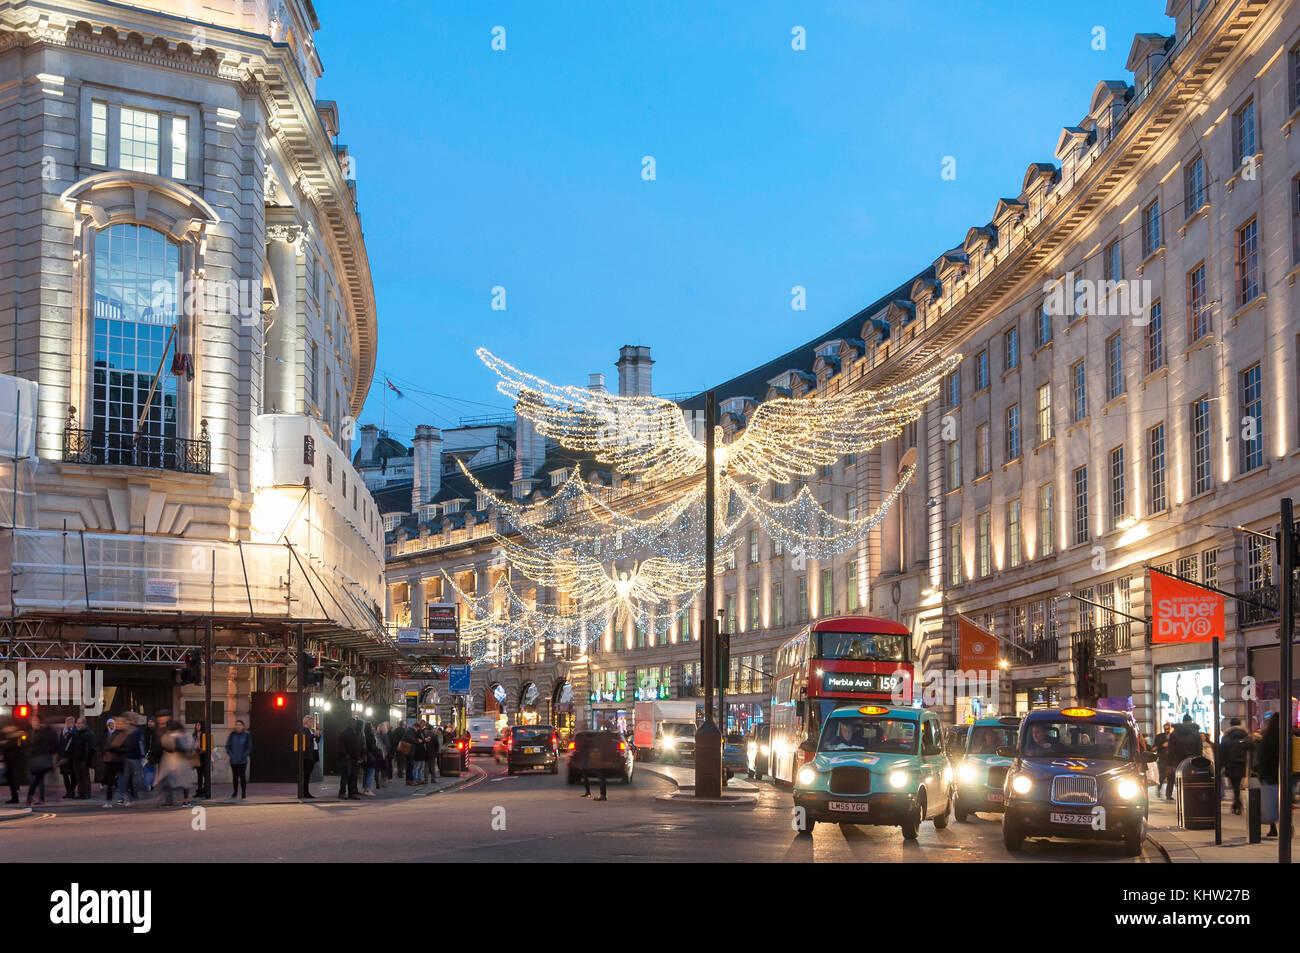 Le luci di Natale al crepuscolo in Regent Street, Soho, City of Westminster, Greater London, England, Regno Unito Immagini Stock